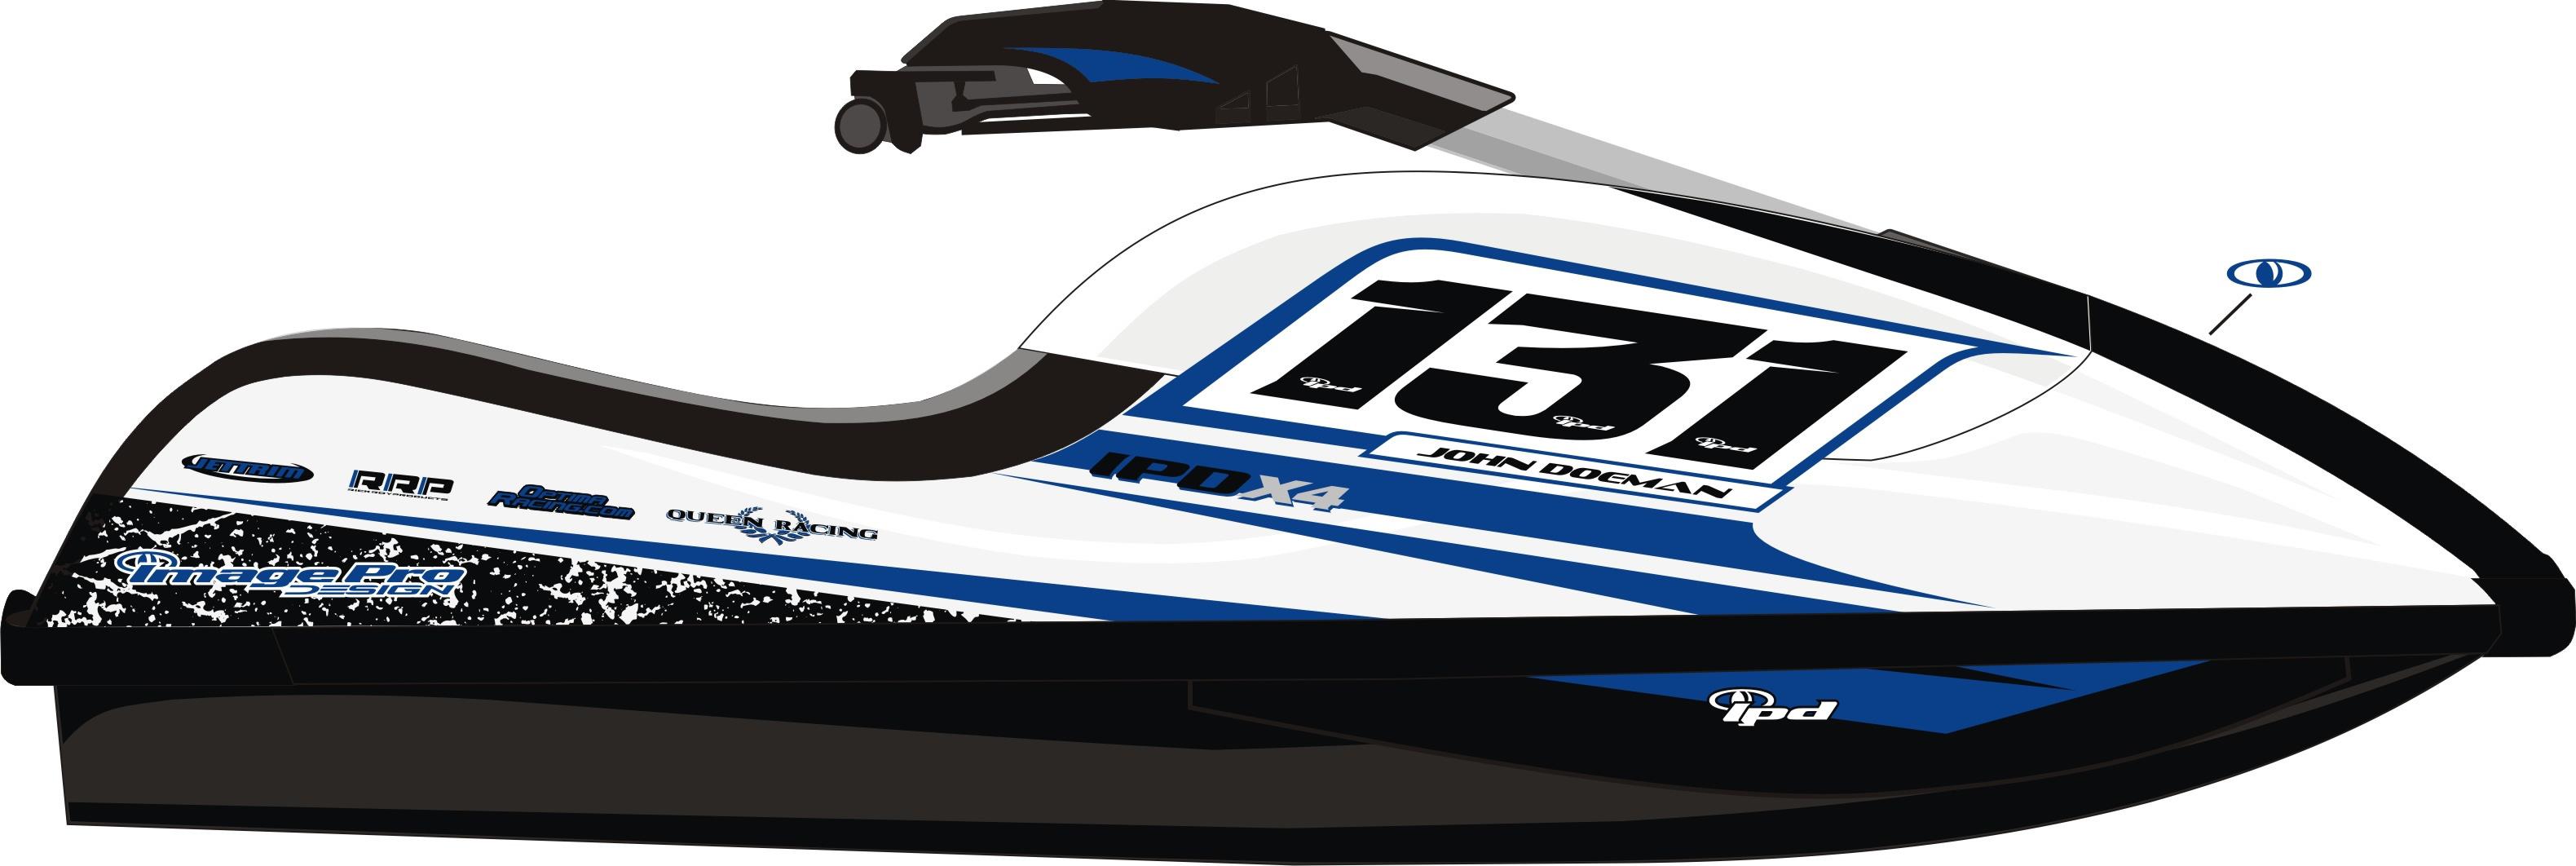 Kawasaki 800 SXR X4 Phantom Design Graphics Kit